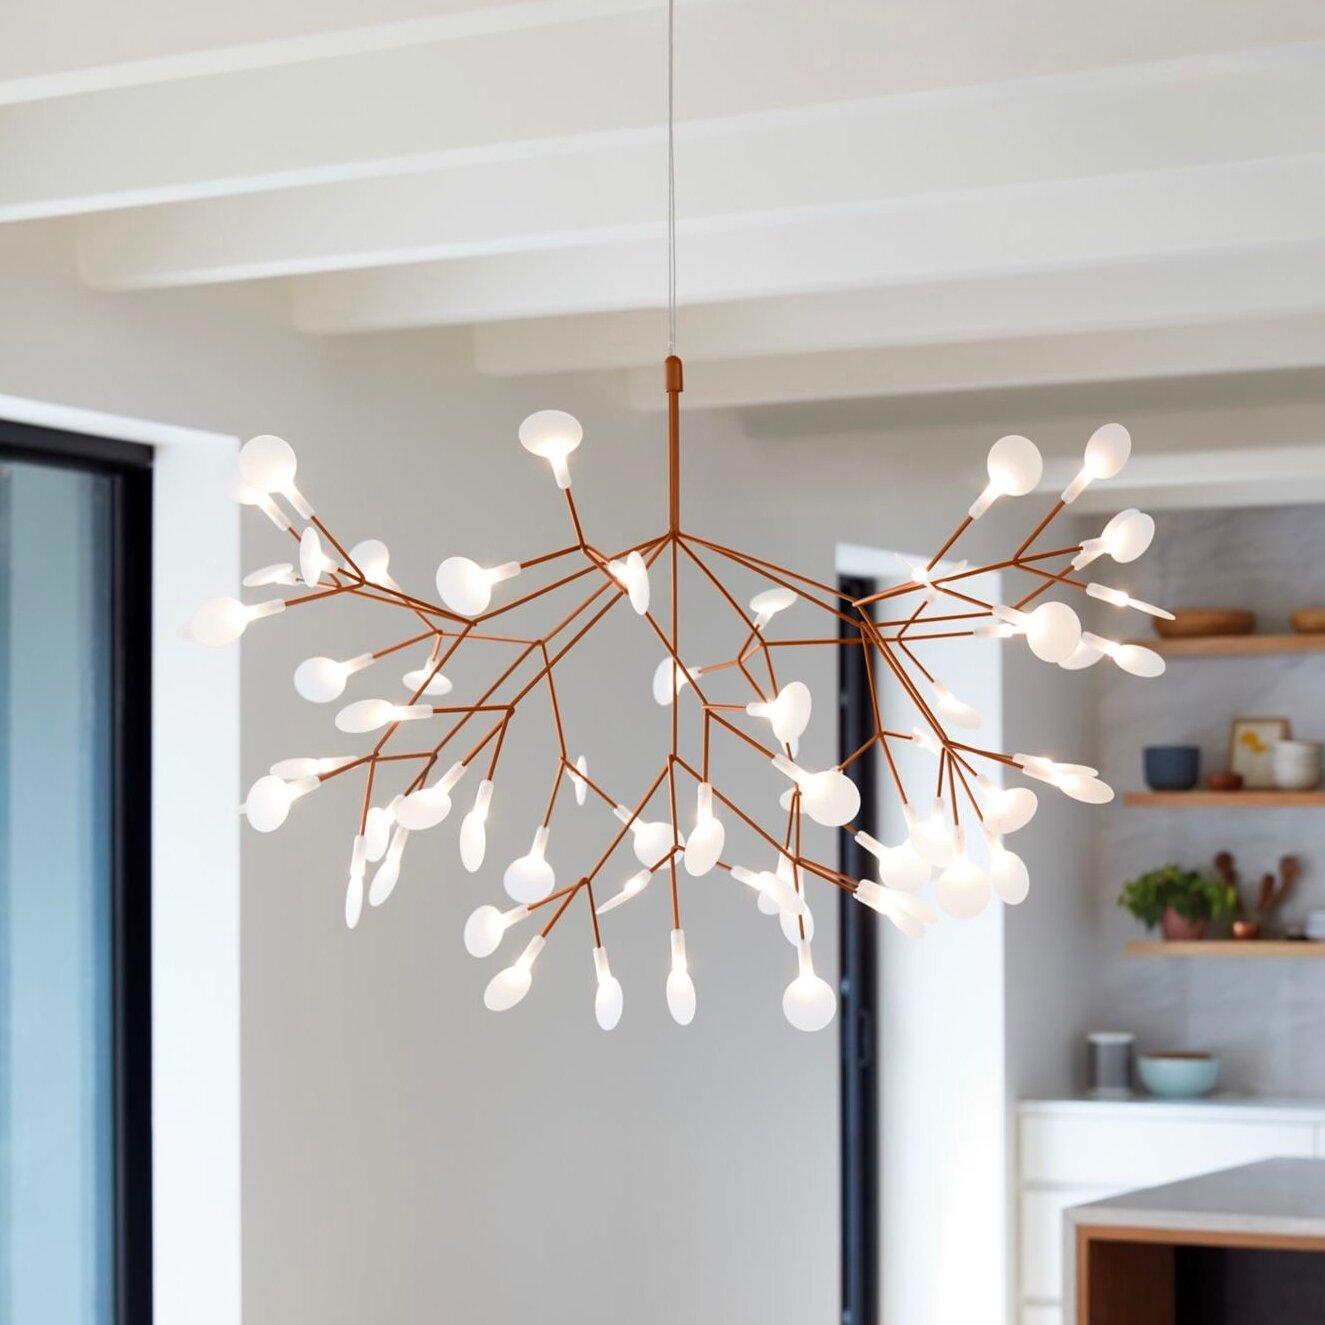 House Of Hampton Heberling 45 Light Unique Modern Linear Led Chandelier Reviews Wayfair